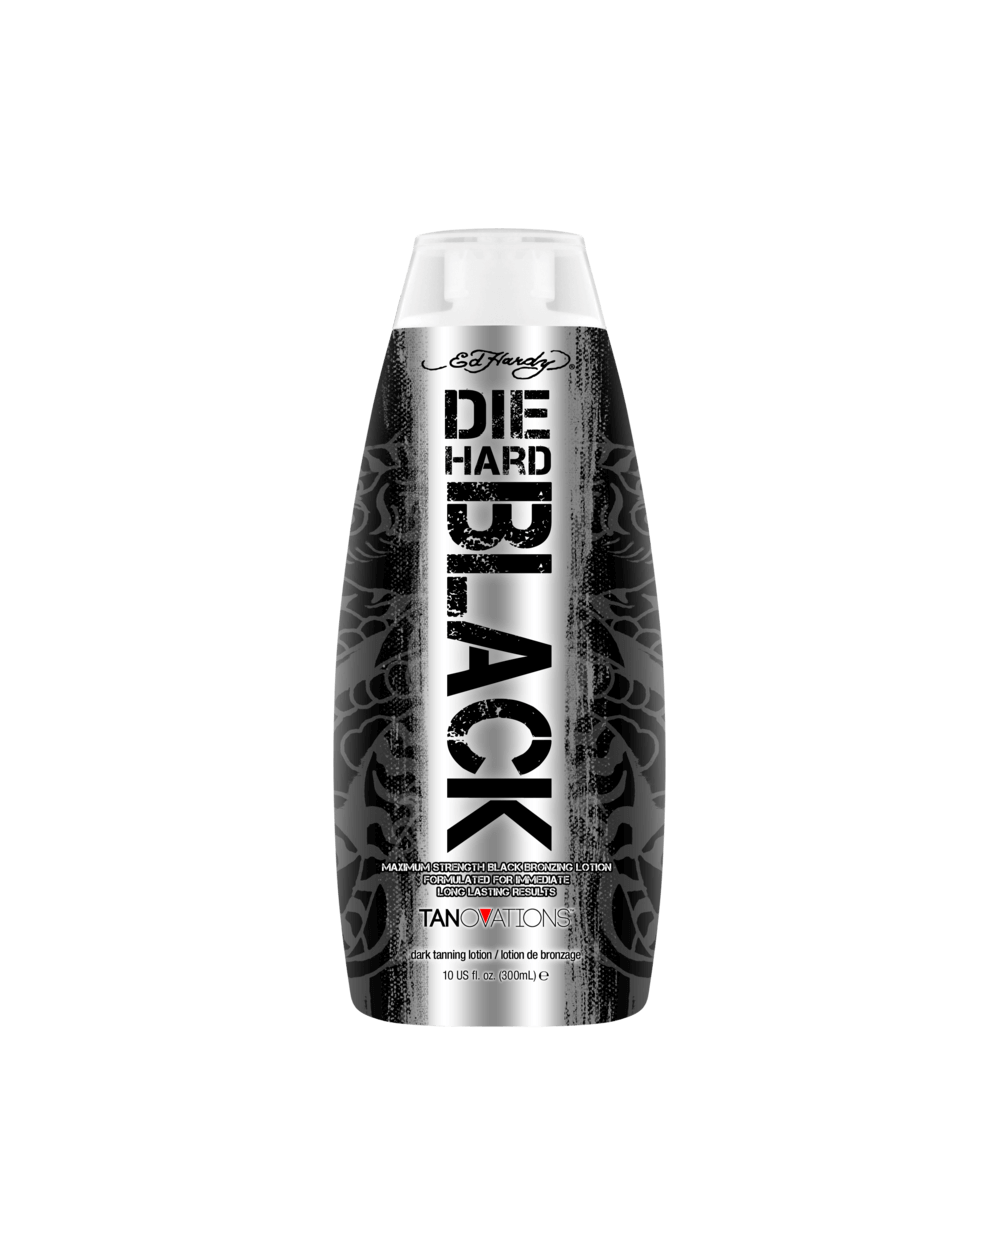 Die Hard Black ™-Soliariumo kremai-TANOVATIONS kosmetika